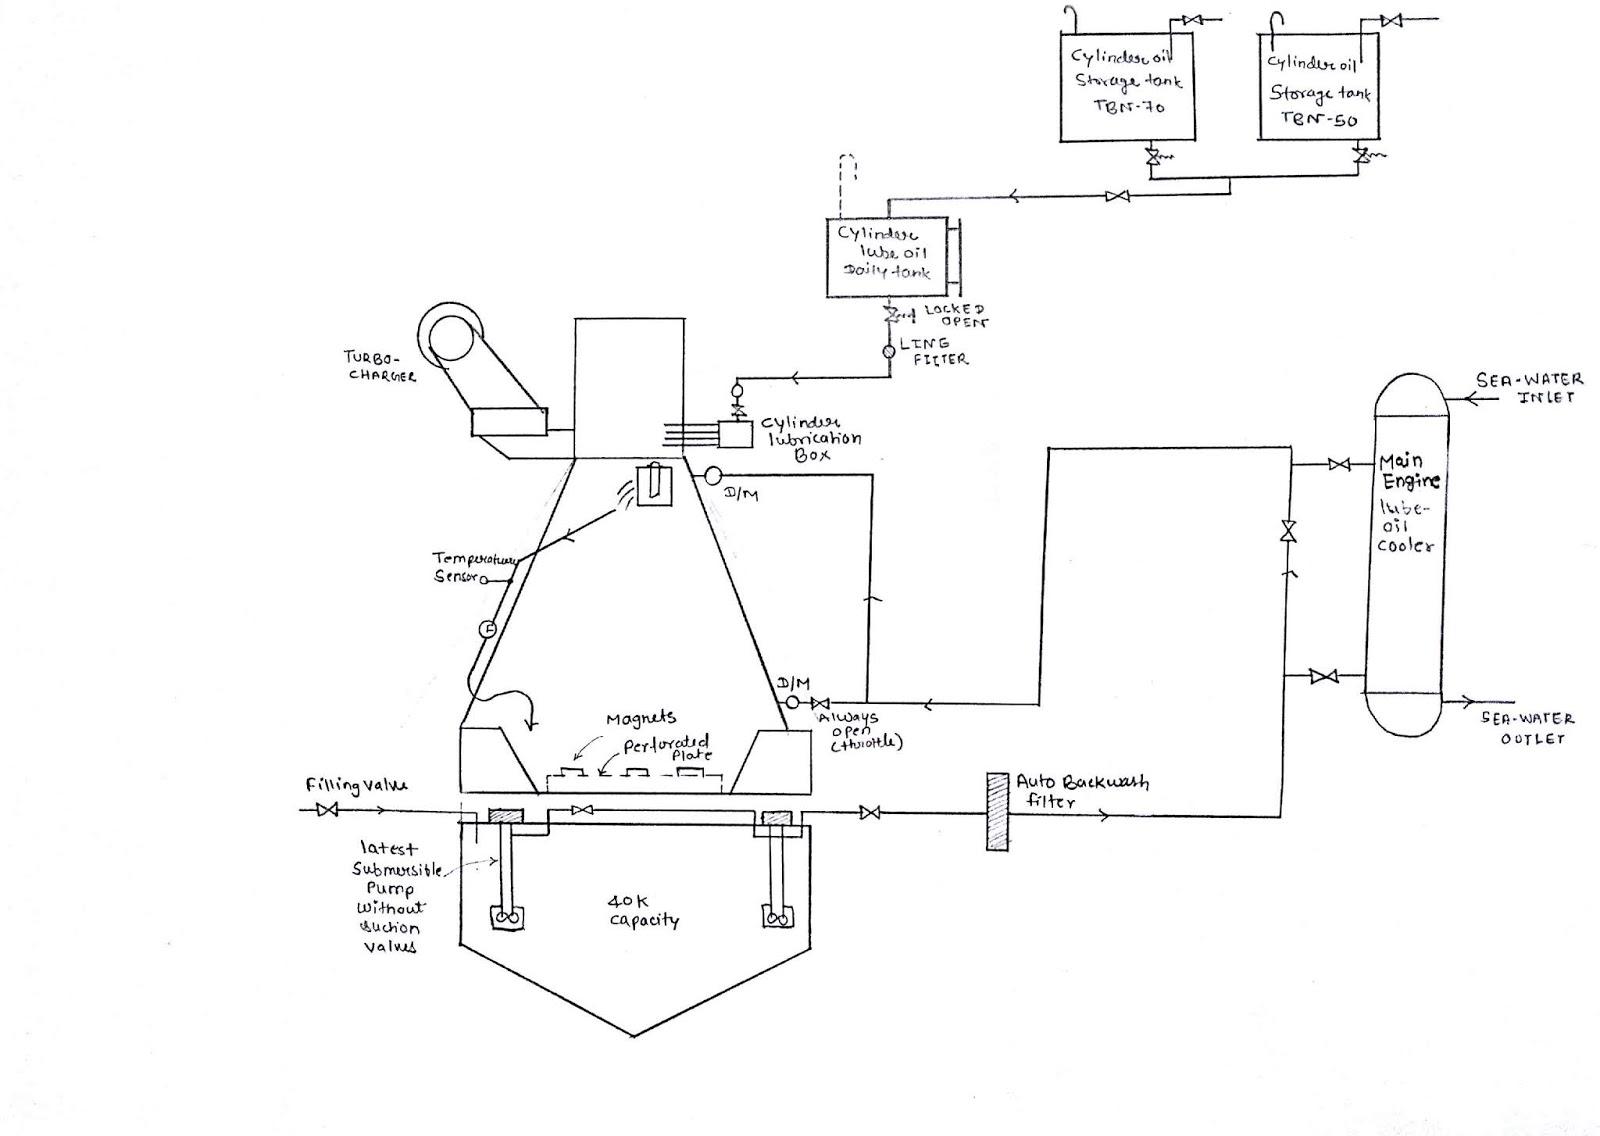 medium resolution of diagram of main engine